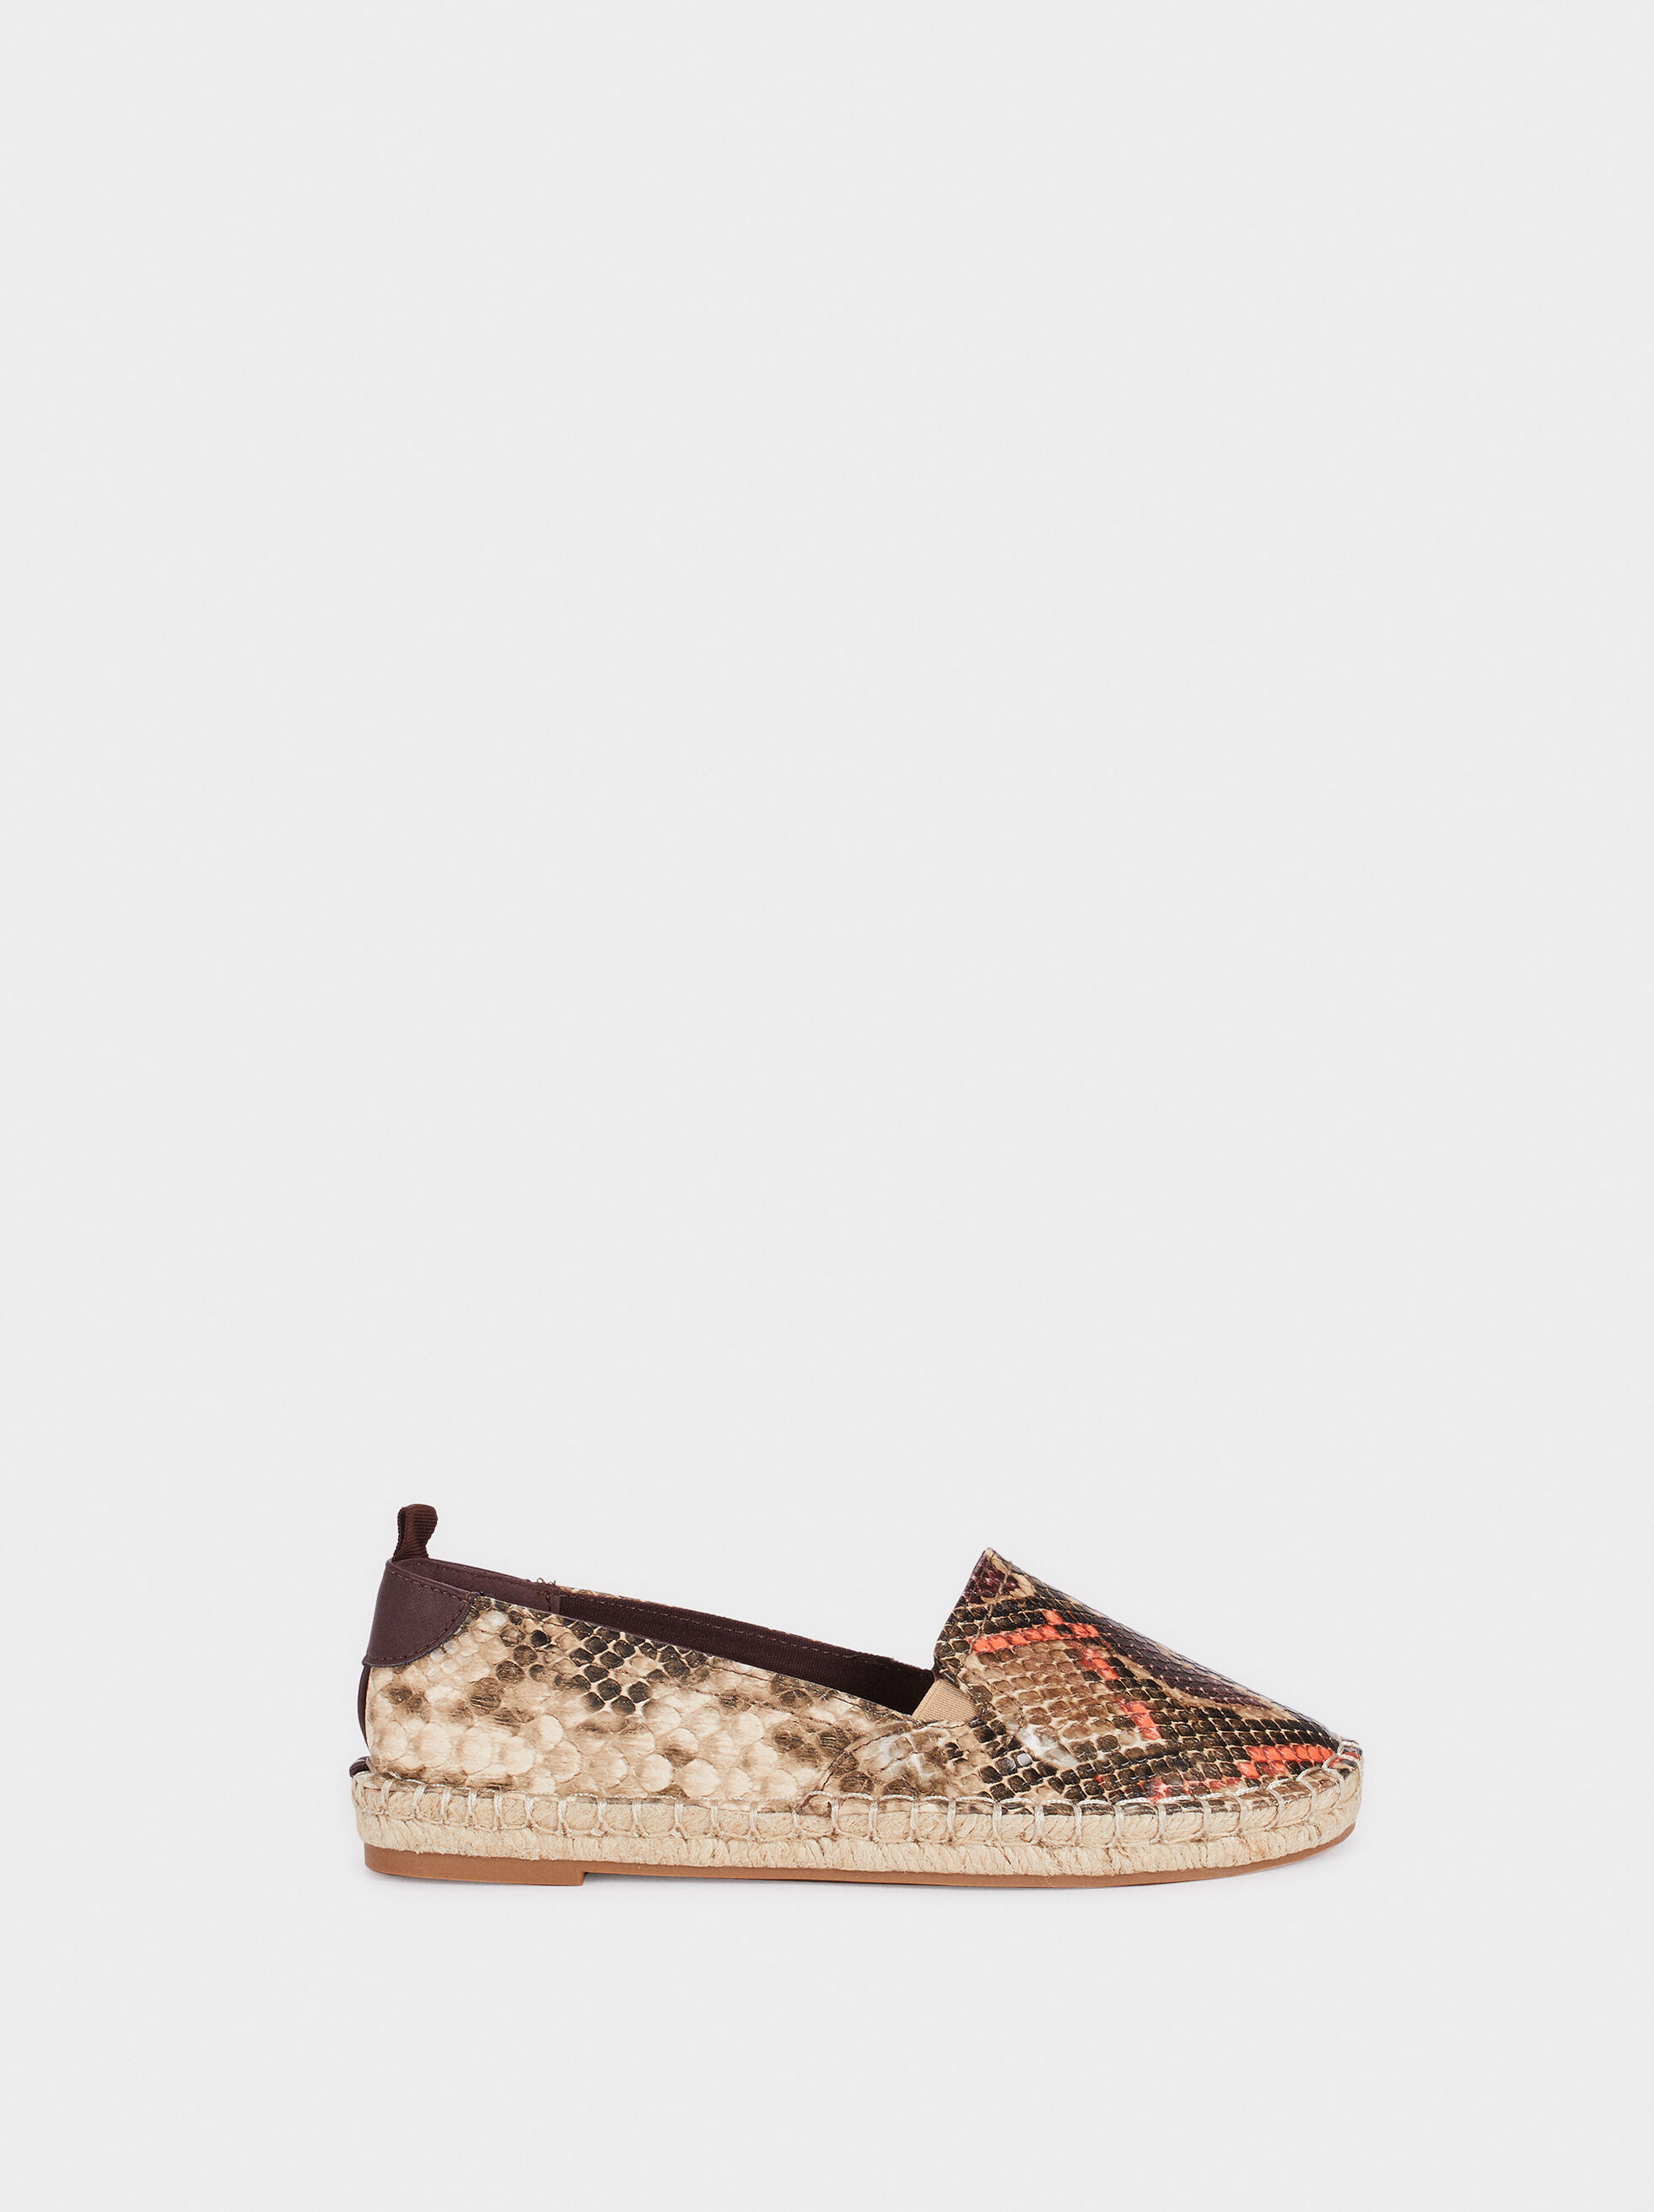 Animal Print Espadrilles - Flat Shoes